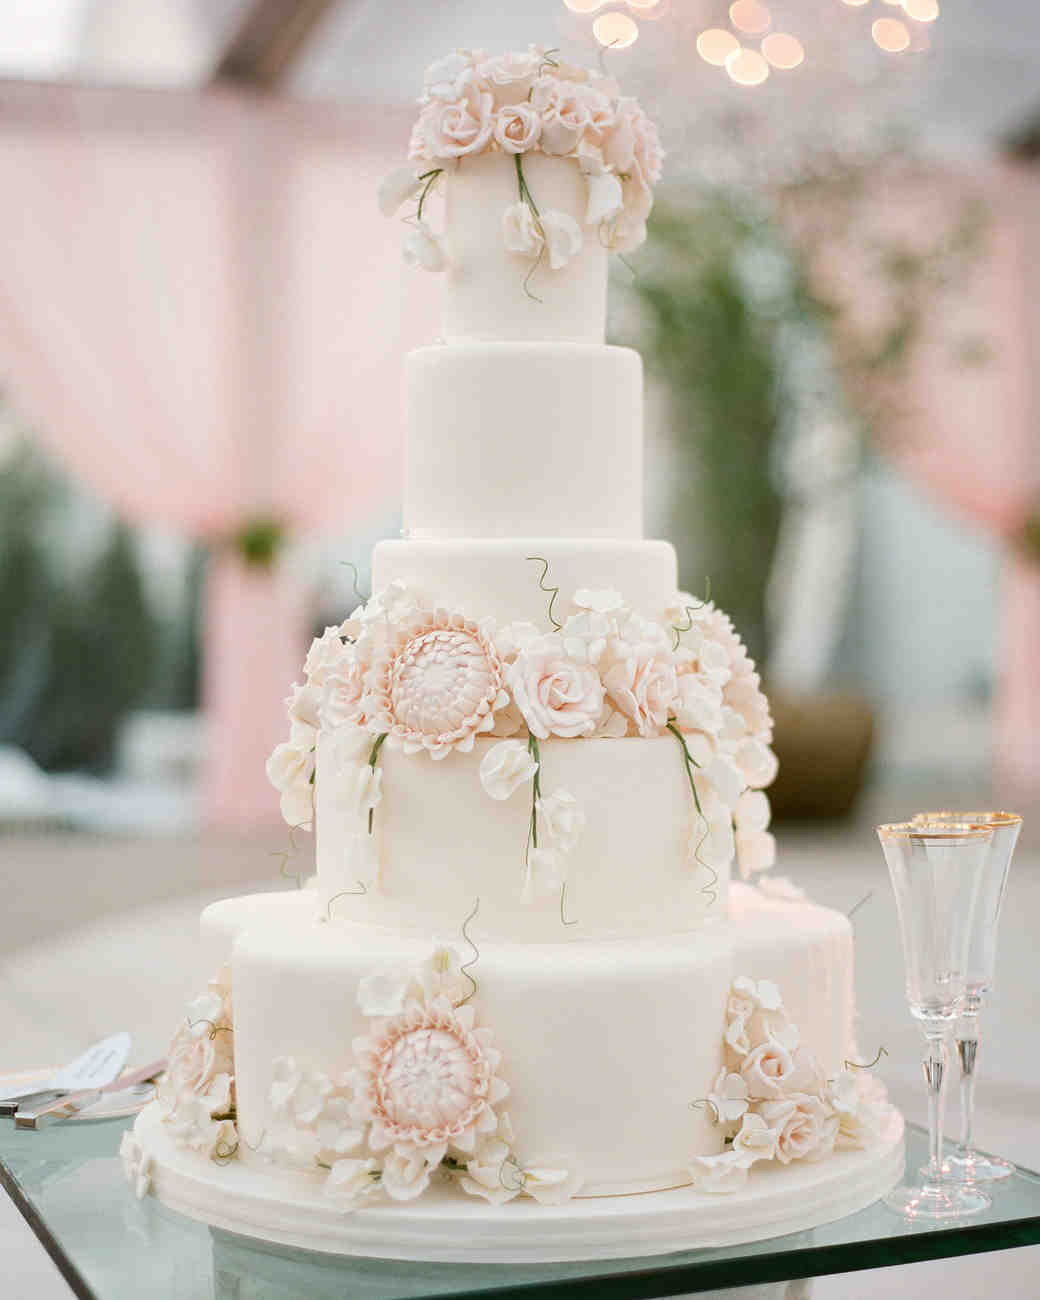 Wedding Cakes Photography  7 Delicious Vegan Wedding Cakes